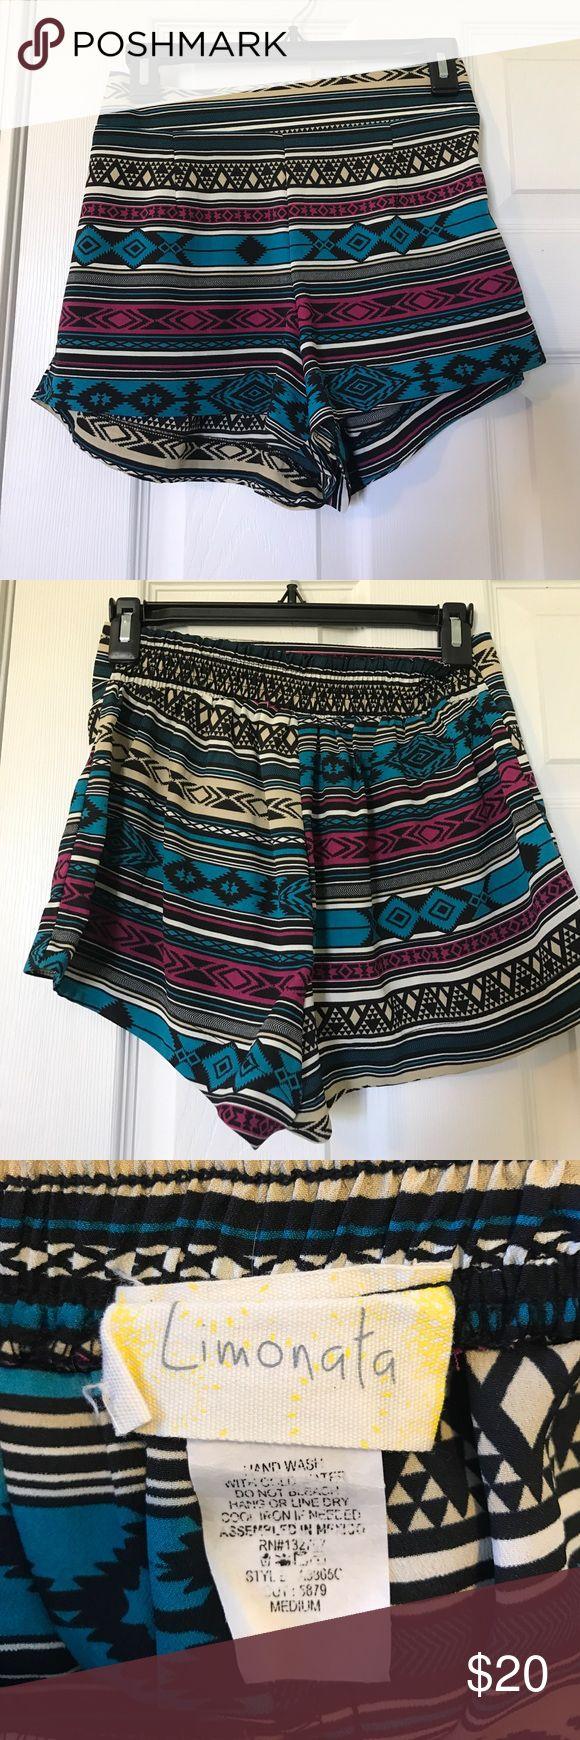 Aztec print shorts Worn once limonata Shorts